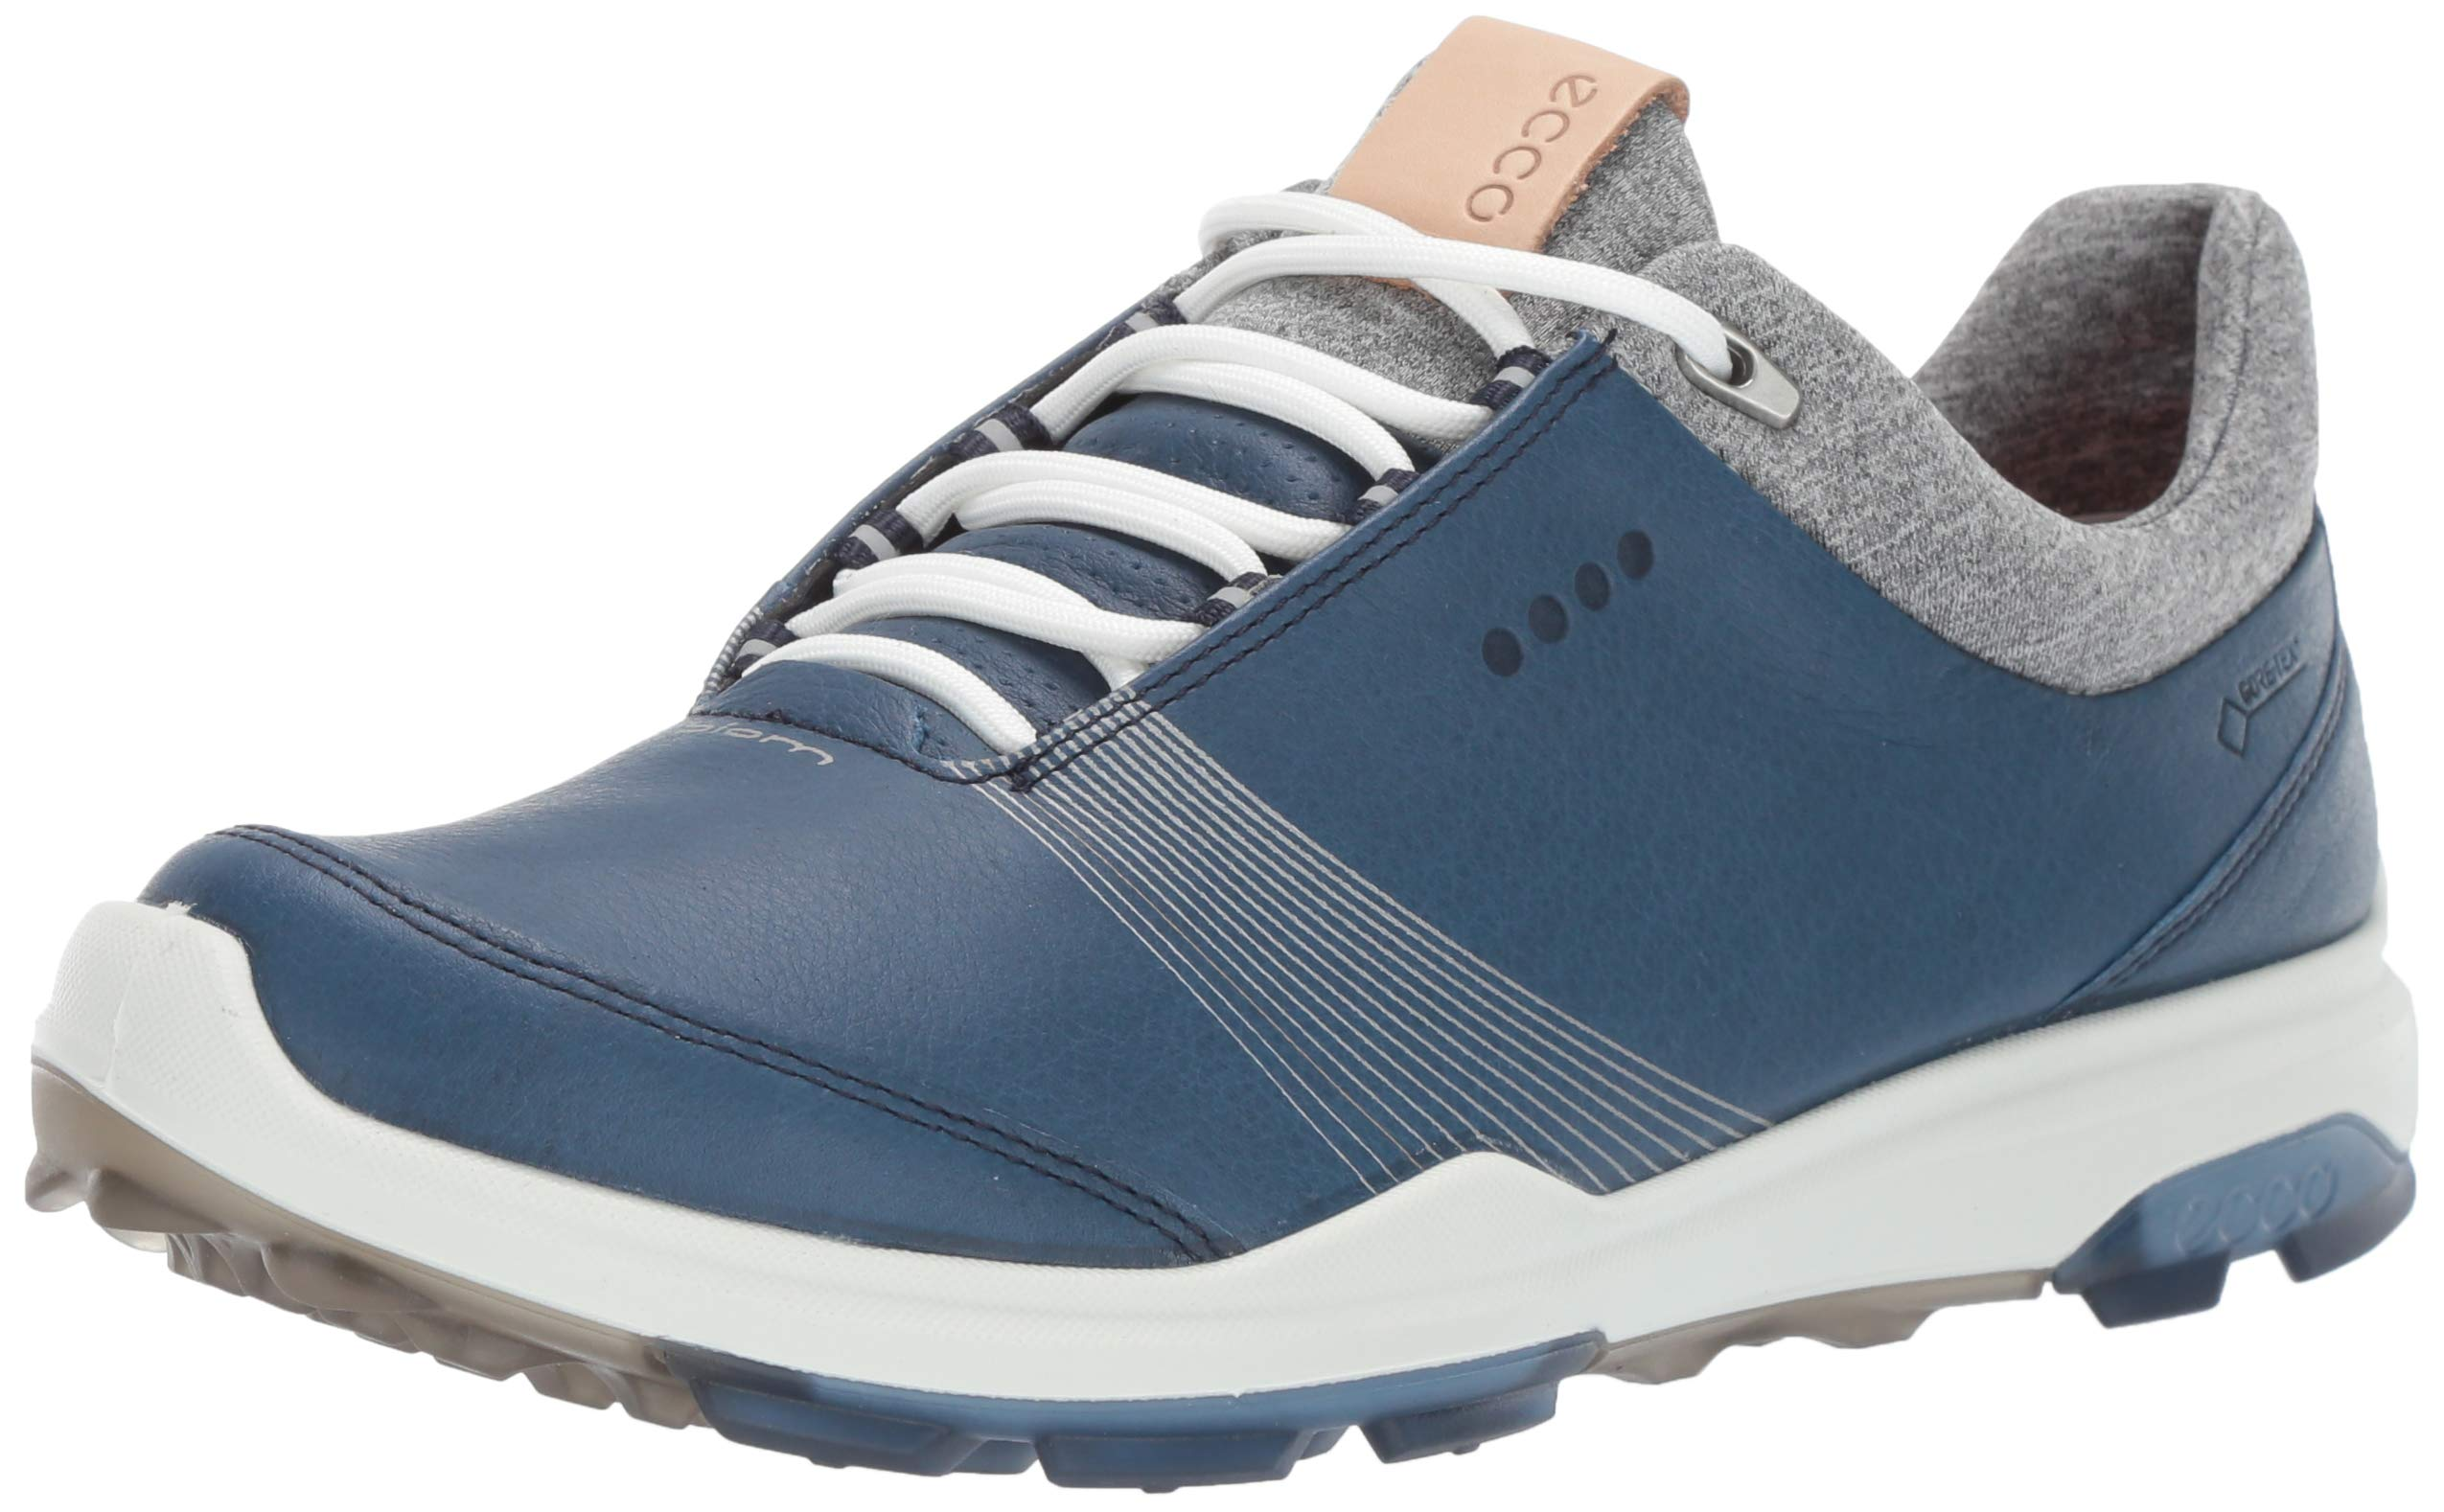 ECCO Women's Biom Hybrid 3 Gore-TEX Golf Shoe, Denim Blue, 35 M EU (4-4.5 US)